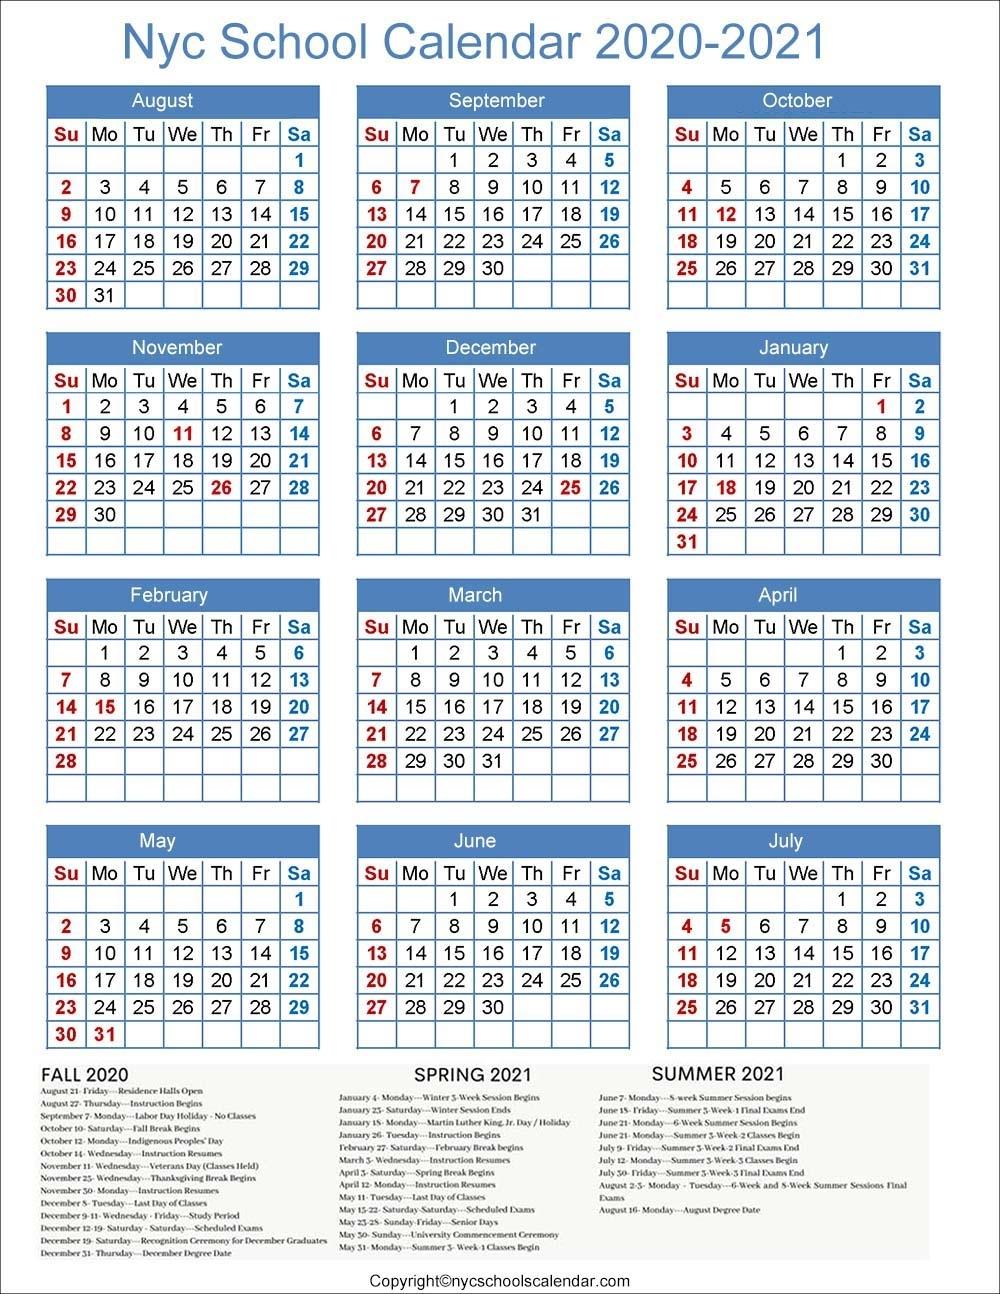 ❤️Nyc School Holidays Calendar 2020-2021 ✅